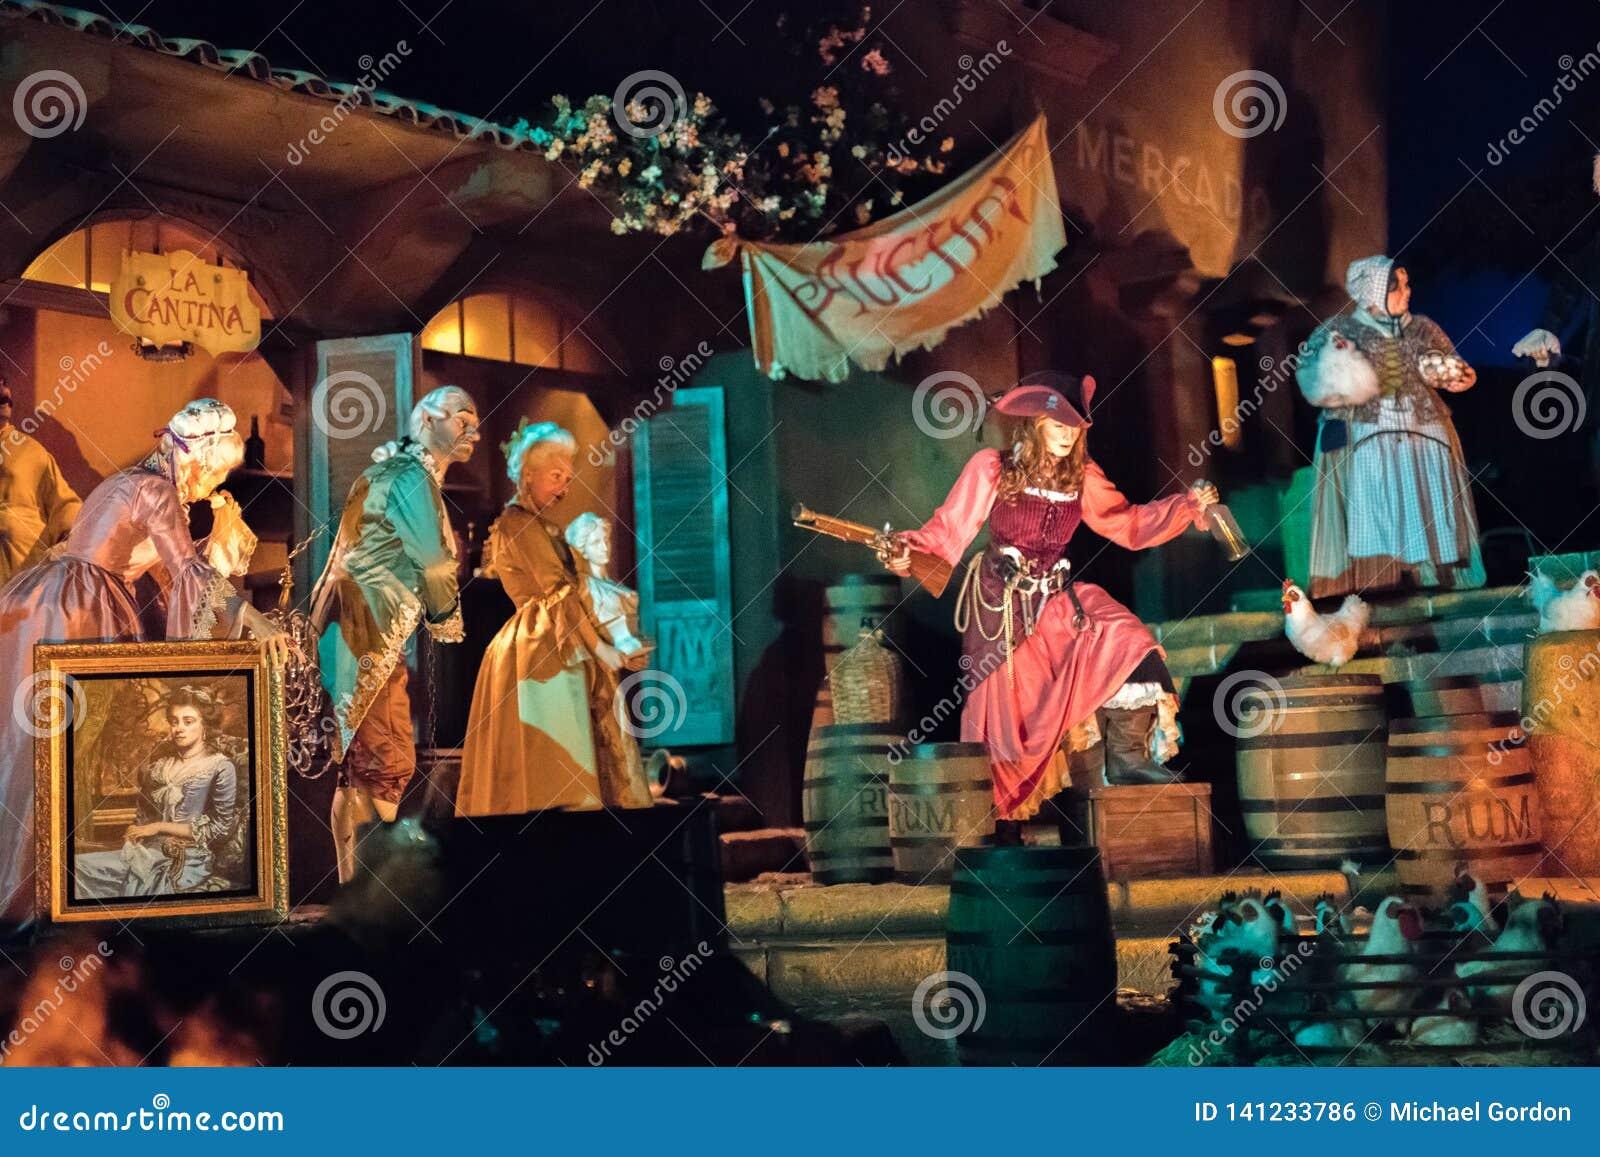 Disneyland Resort nöjesfält i Anaheim, Kalifornien